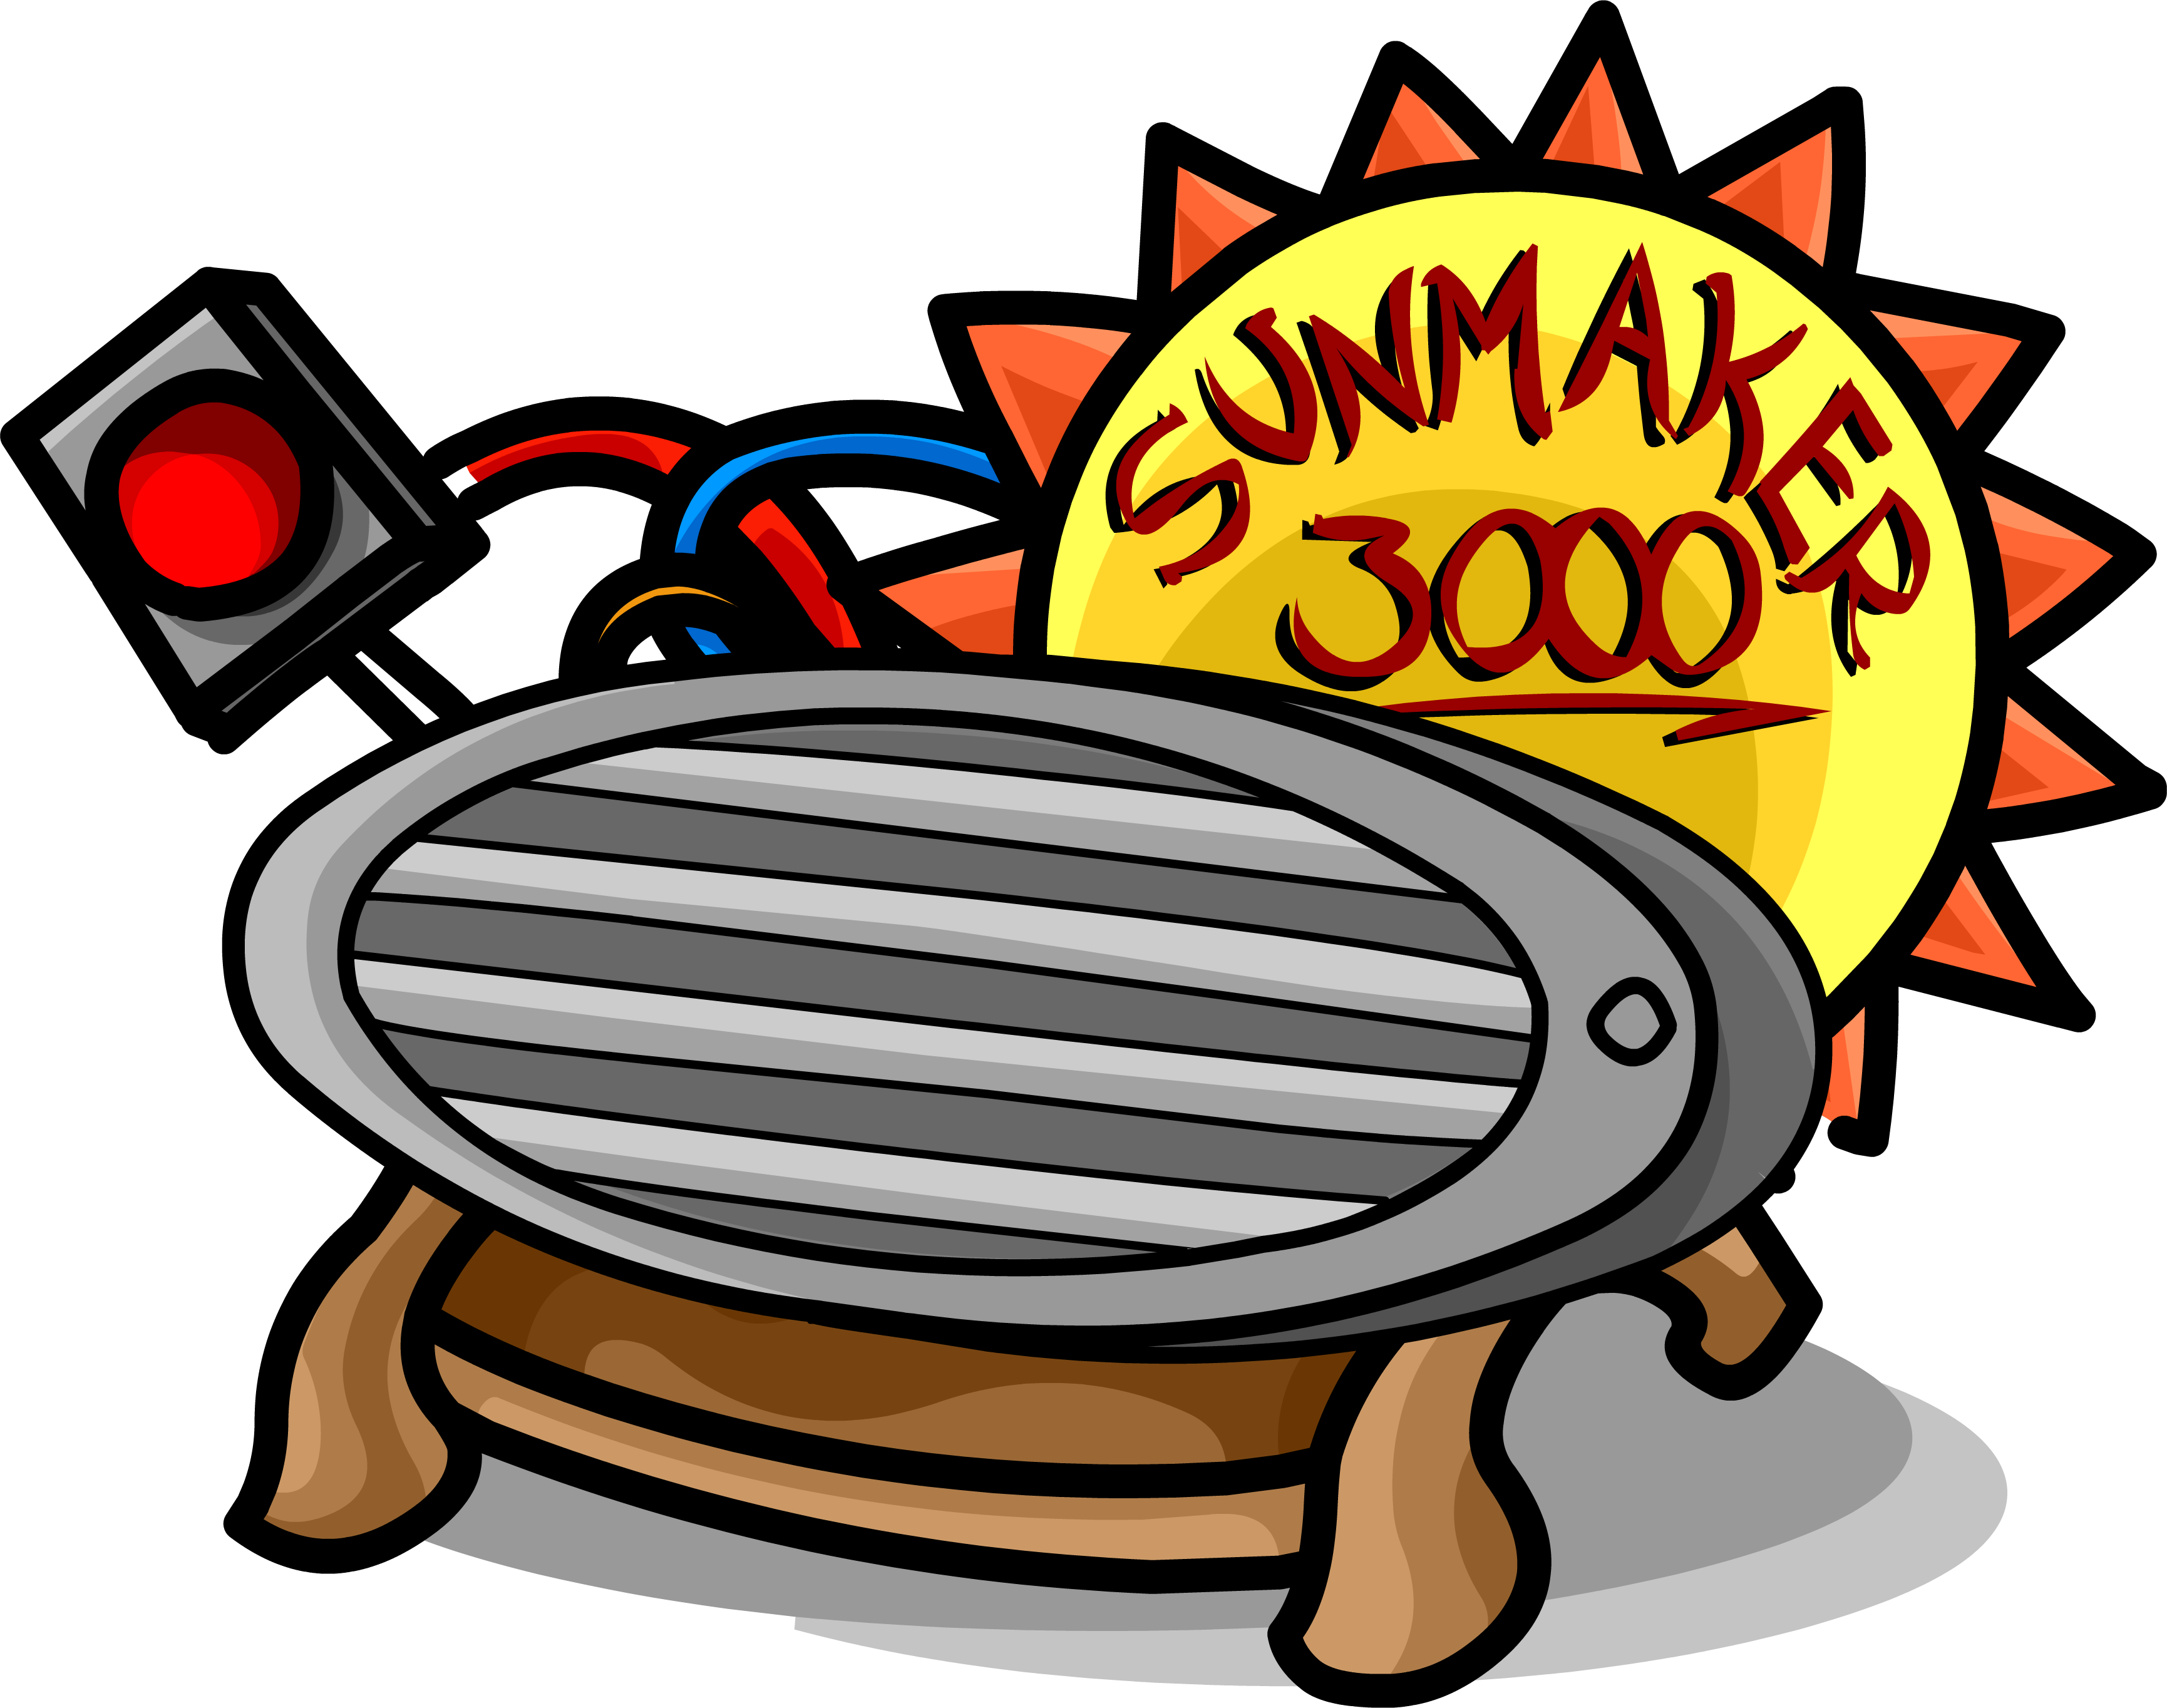 File:Sun Maker 3000.png